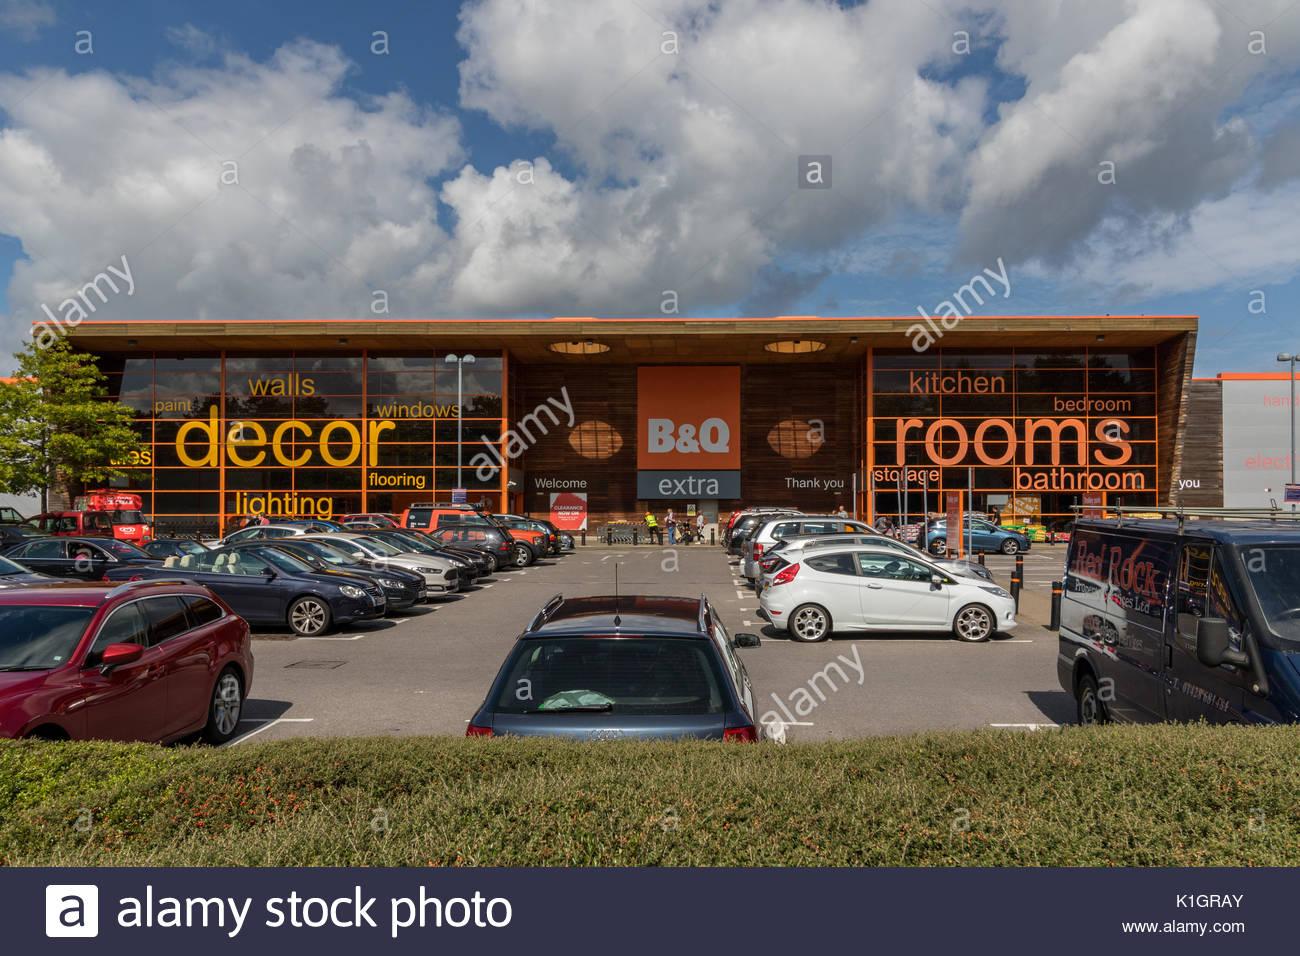 The exterior of the B&Q Store, Farnborough, Hampshire. - Stock Image